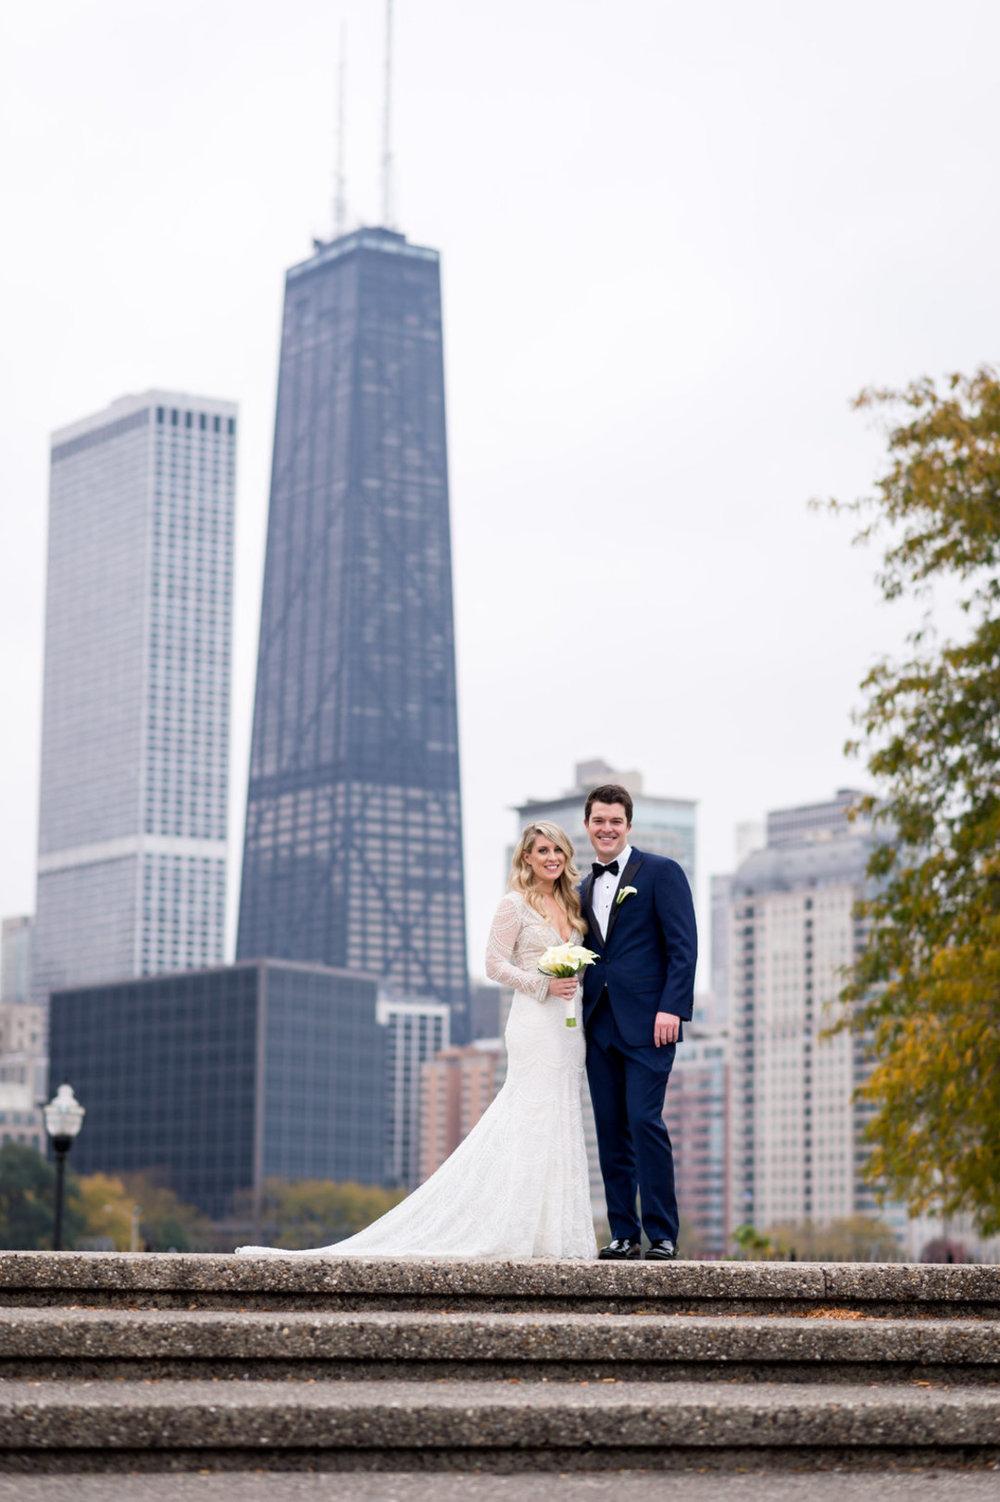 Romantic Bride and Groom Portrait Chicago Wedding Julia Franzosa Photography